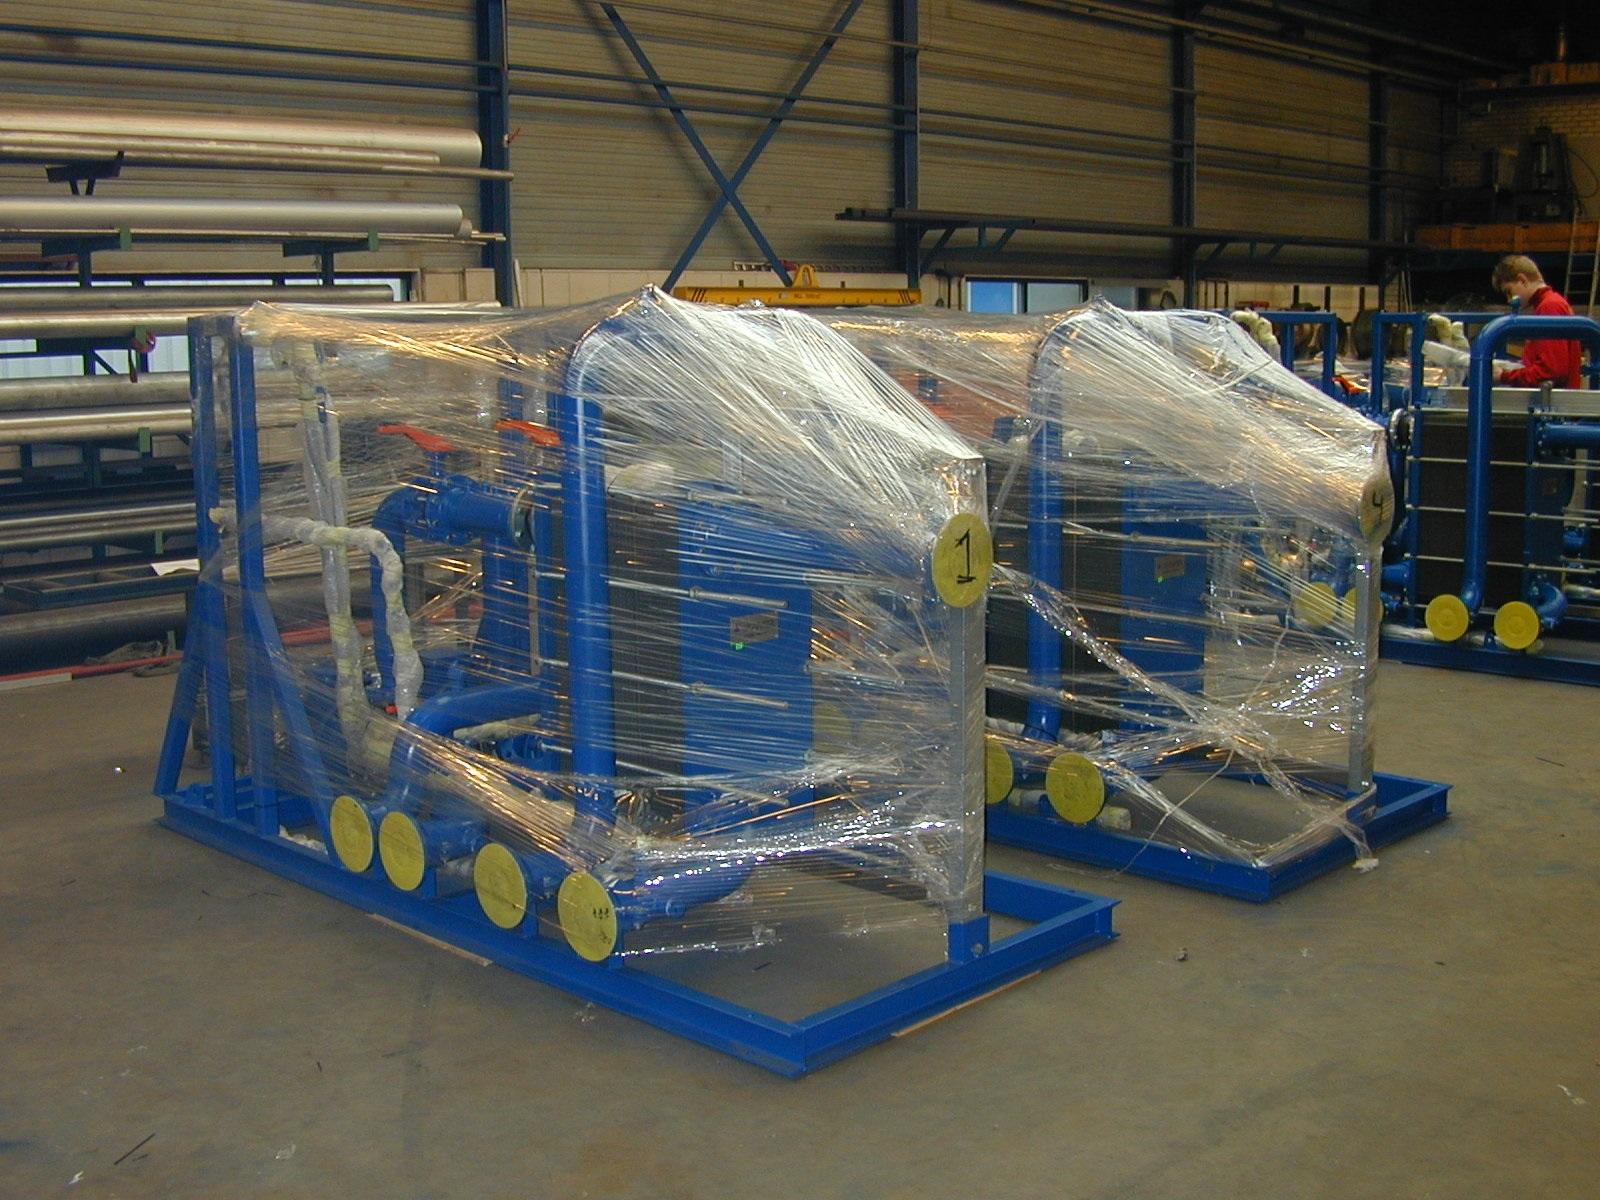 bespoke manufactured sewage treatment cooling solution